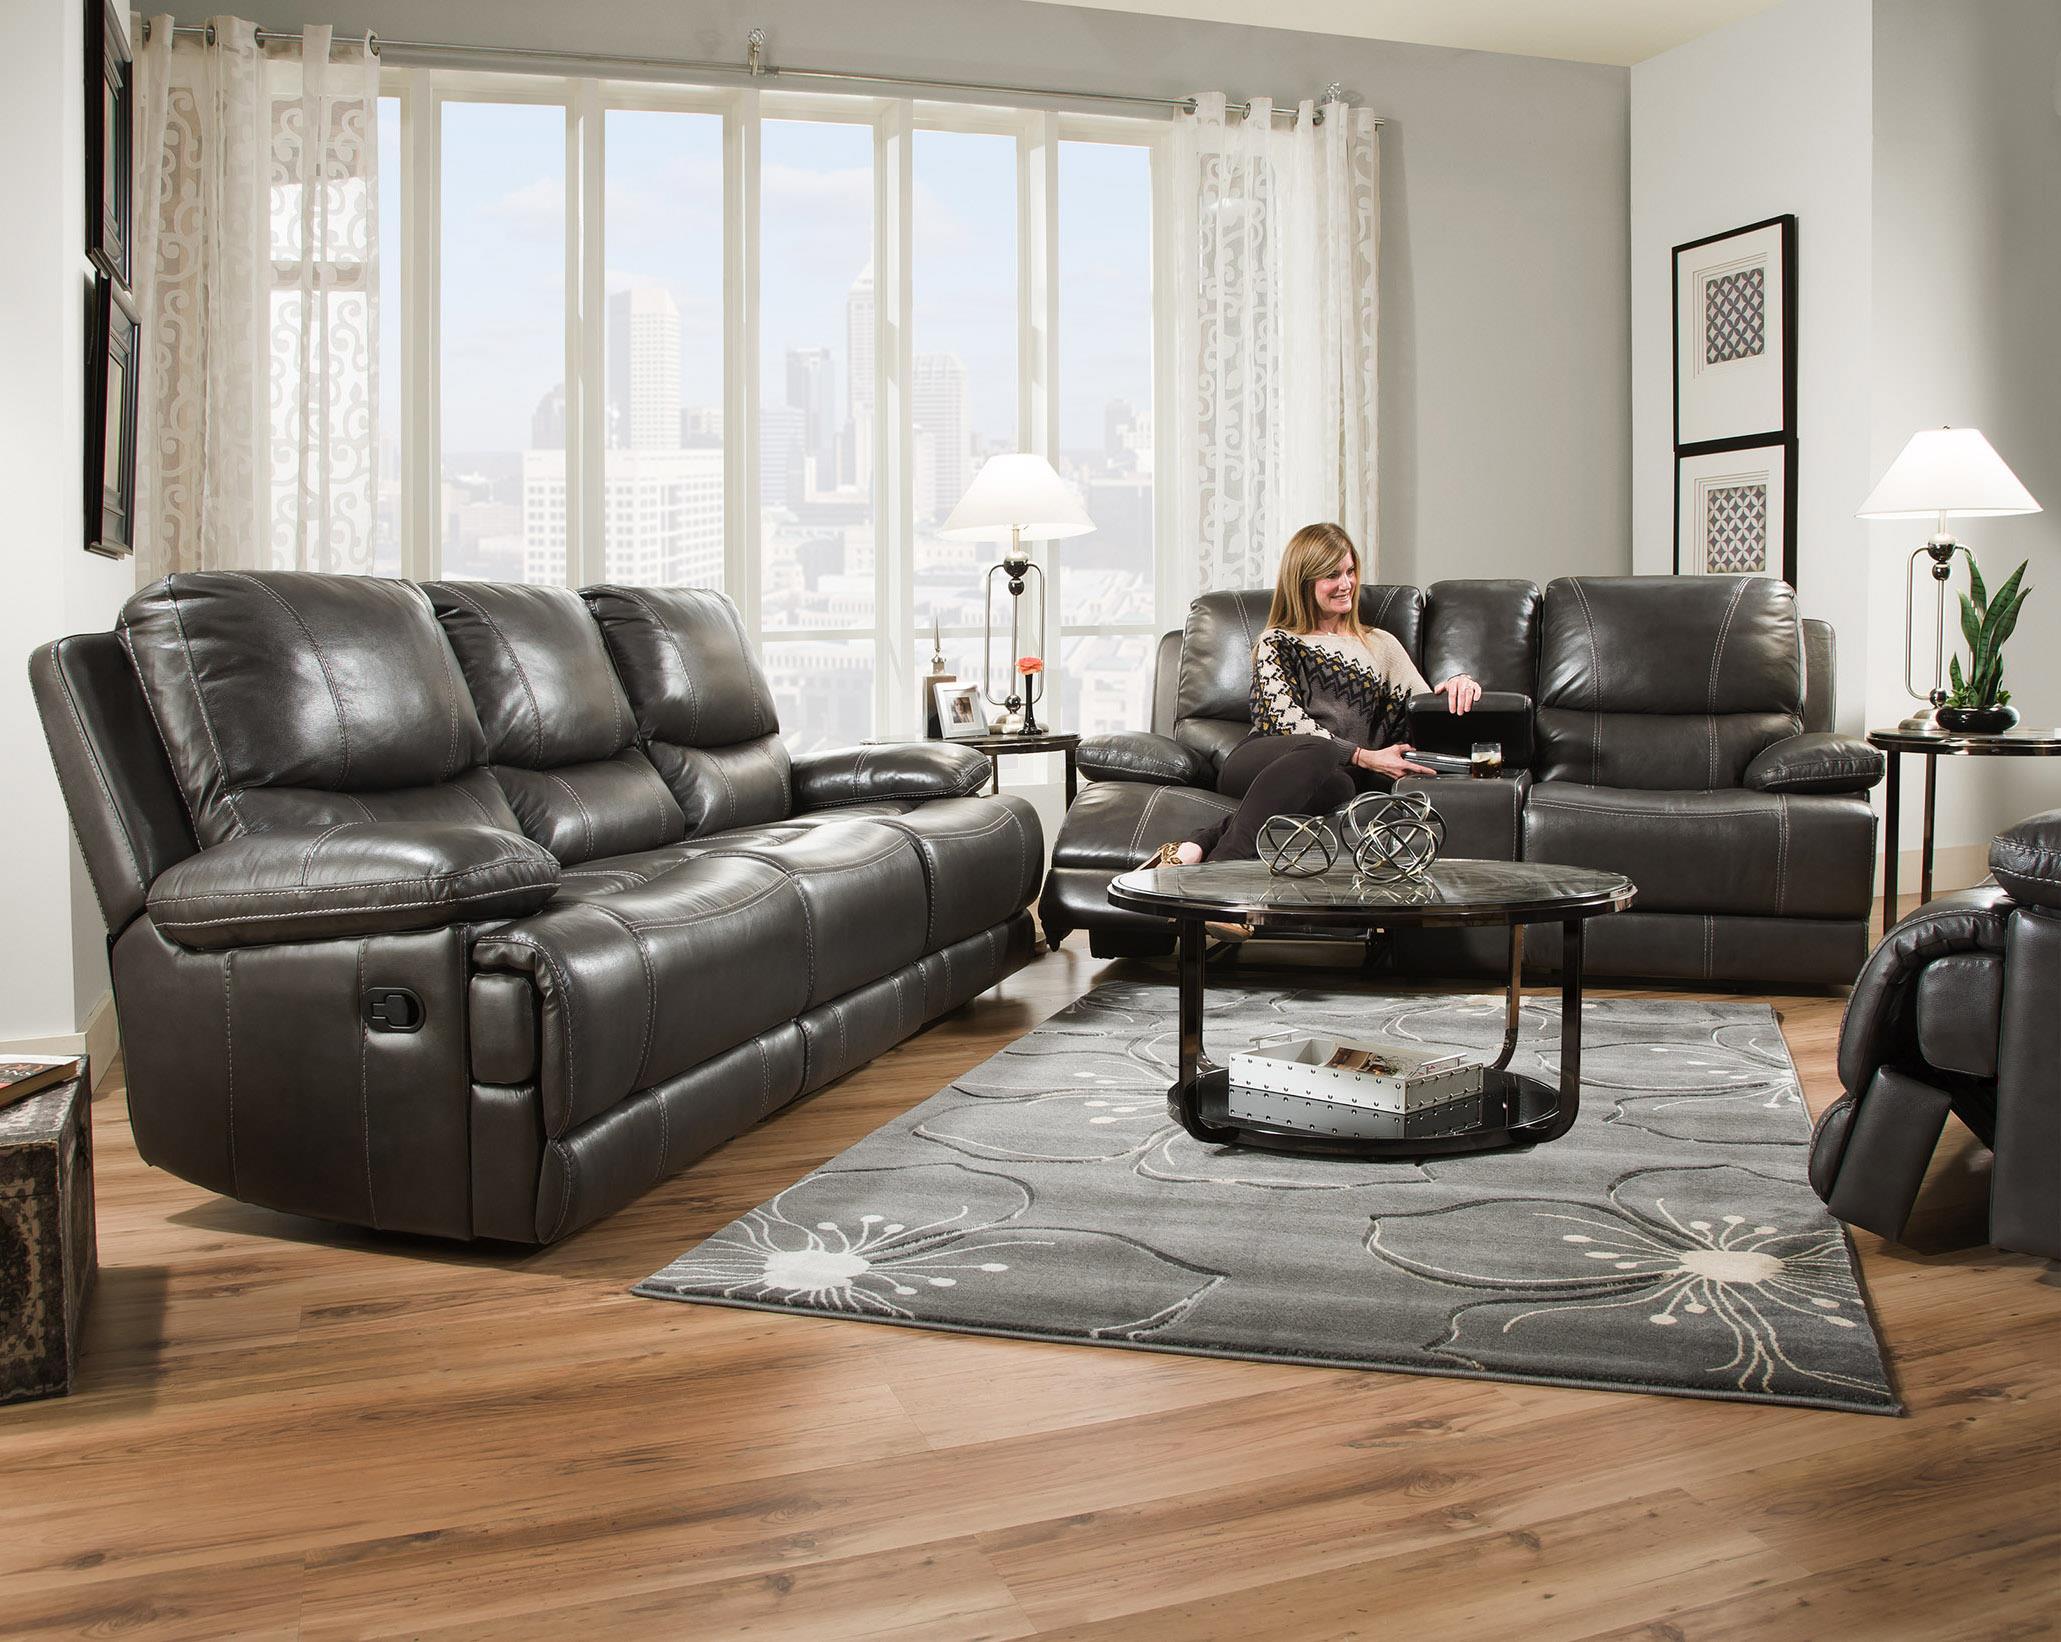 Corinthian Brooklyn Charcoal CORI 42801 30,BROOKLYN CHARCOAL Brooklyn  Charcoal Leather Reclining Sofa